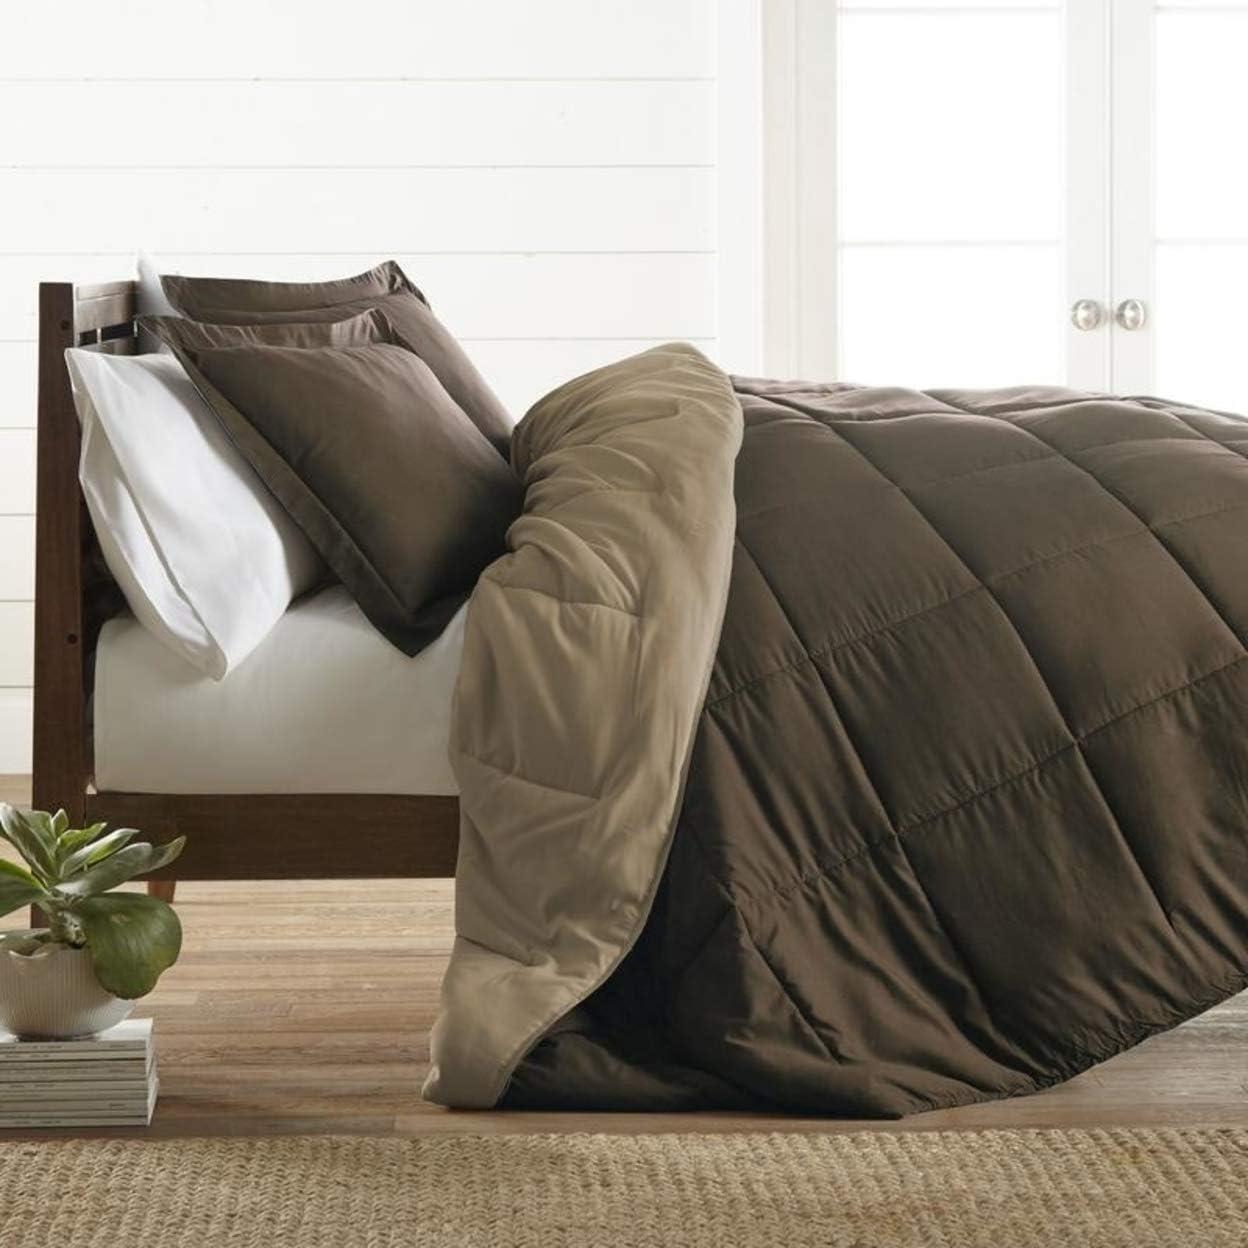 ienjoy Home Premium Down Alternative Reversible Comforter Set, Full/Queen, Taupe